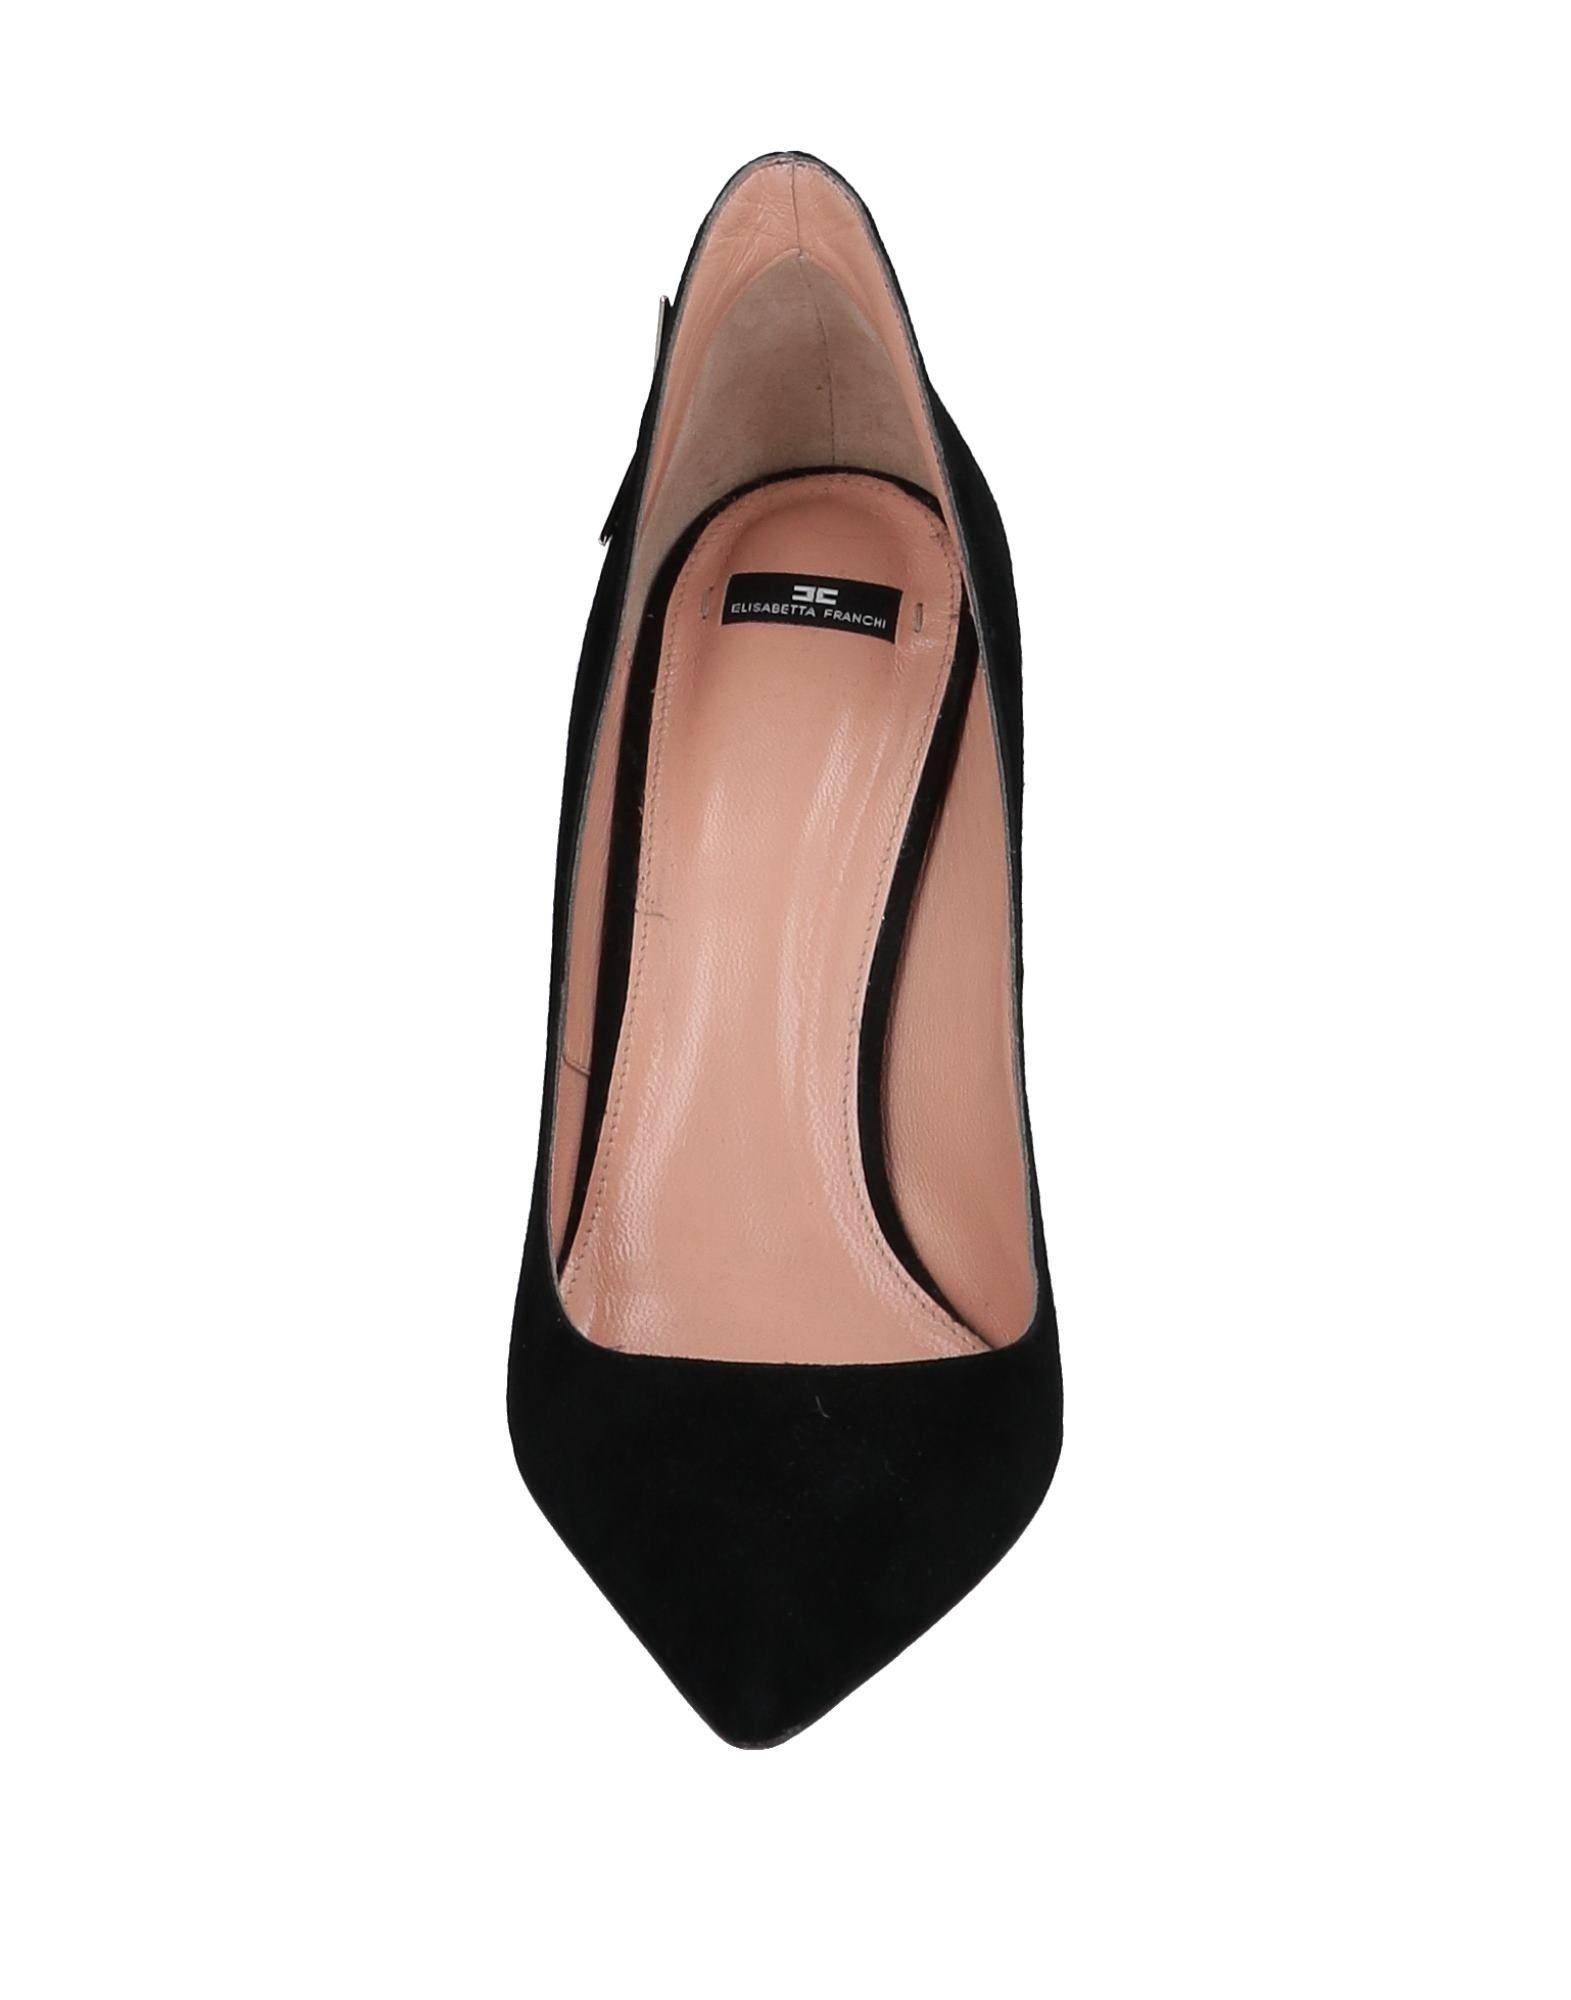 Elisabetta Damen Franchi Pumps Damen Elisabetta  11532576CK Neue Schuhe 7aa173